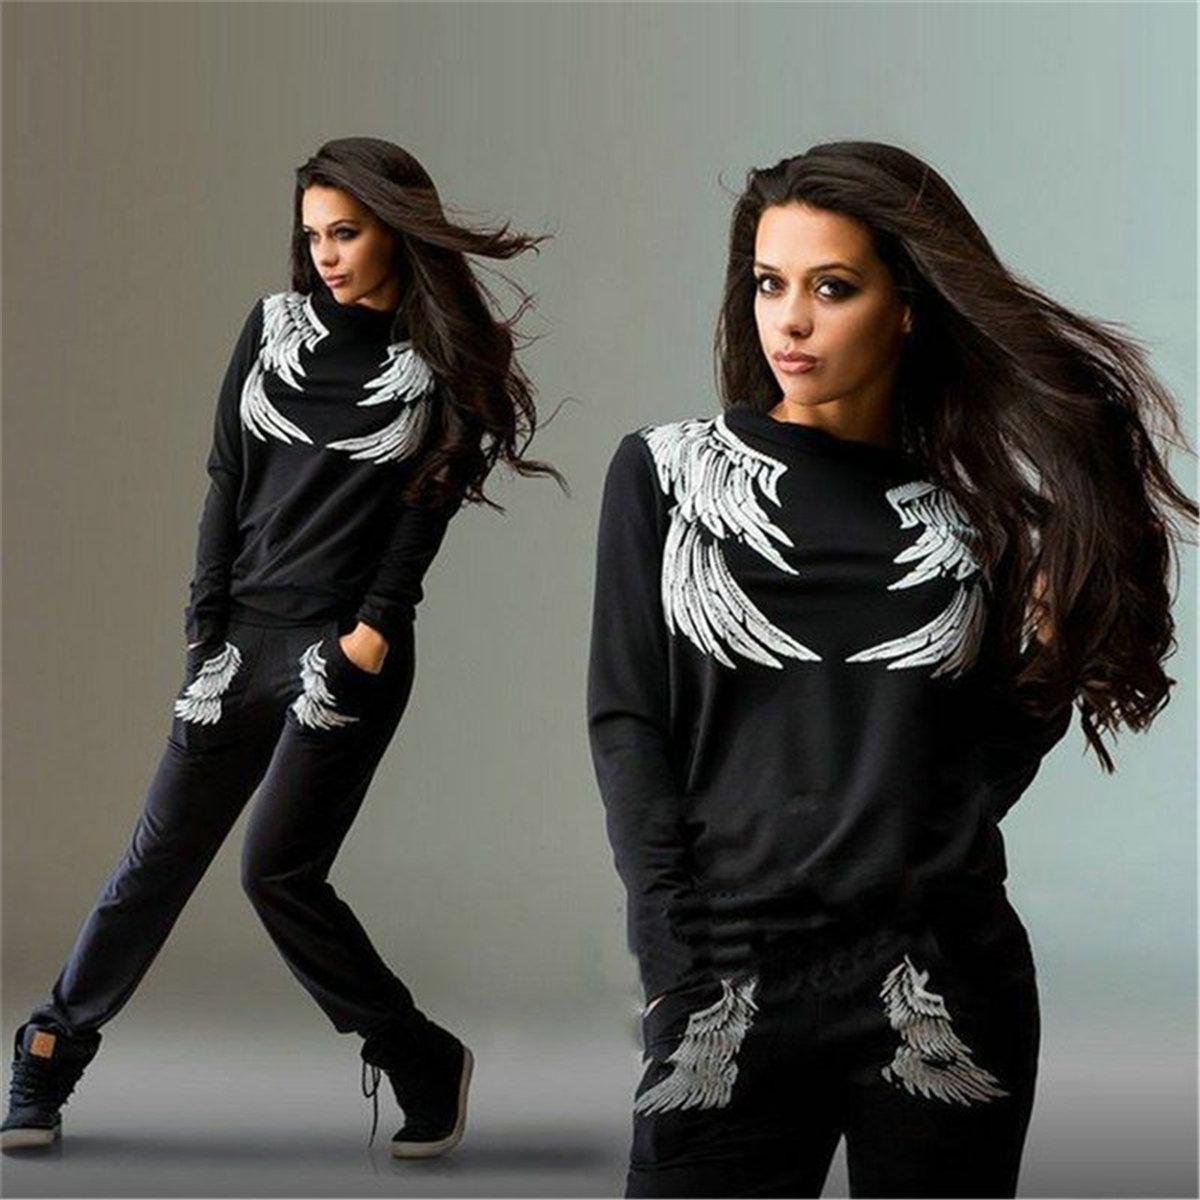 Hot Brand 2019 Women Suit Tracksuit Wing Printing Set Spring Autumn Women Tops + Pants Fashion Suit Female Clothes Plus Size